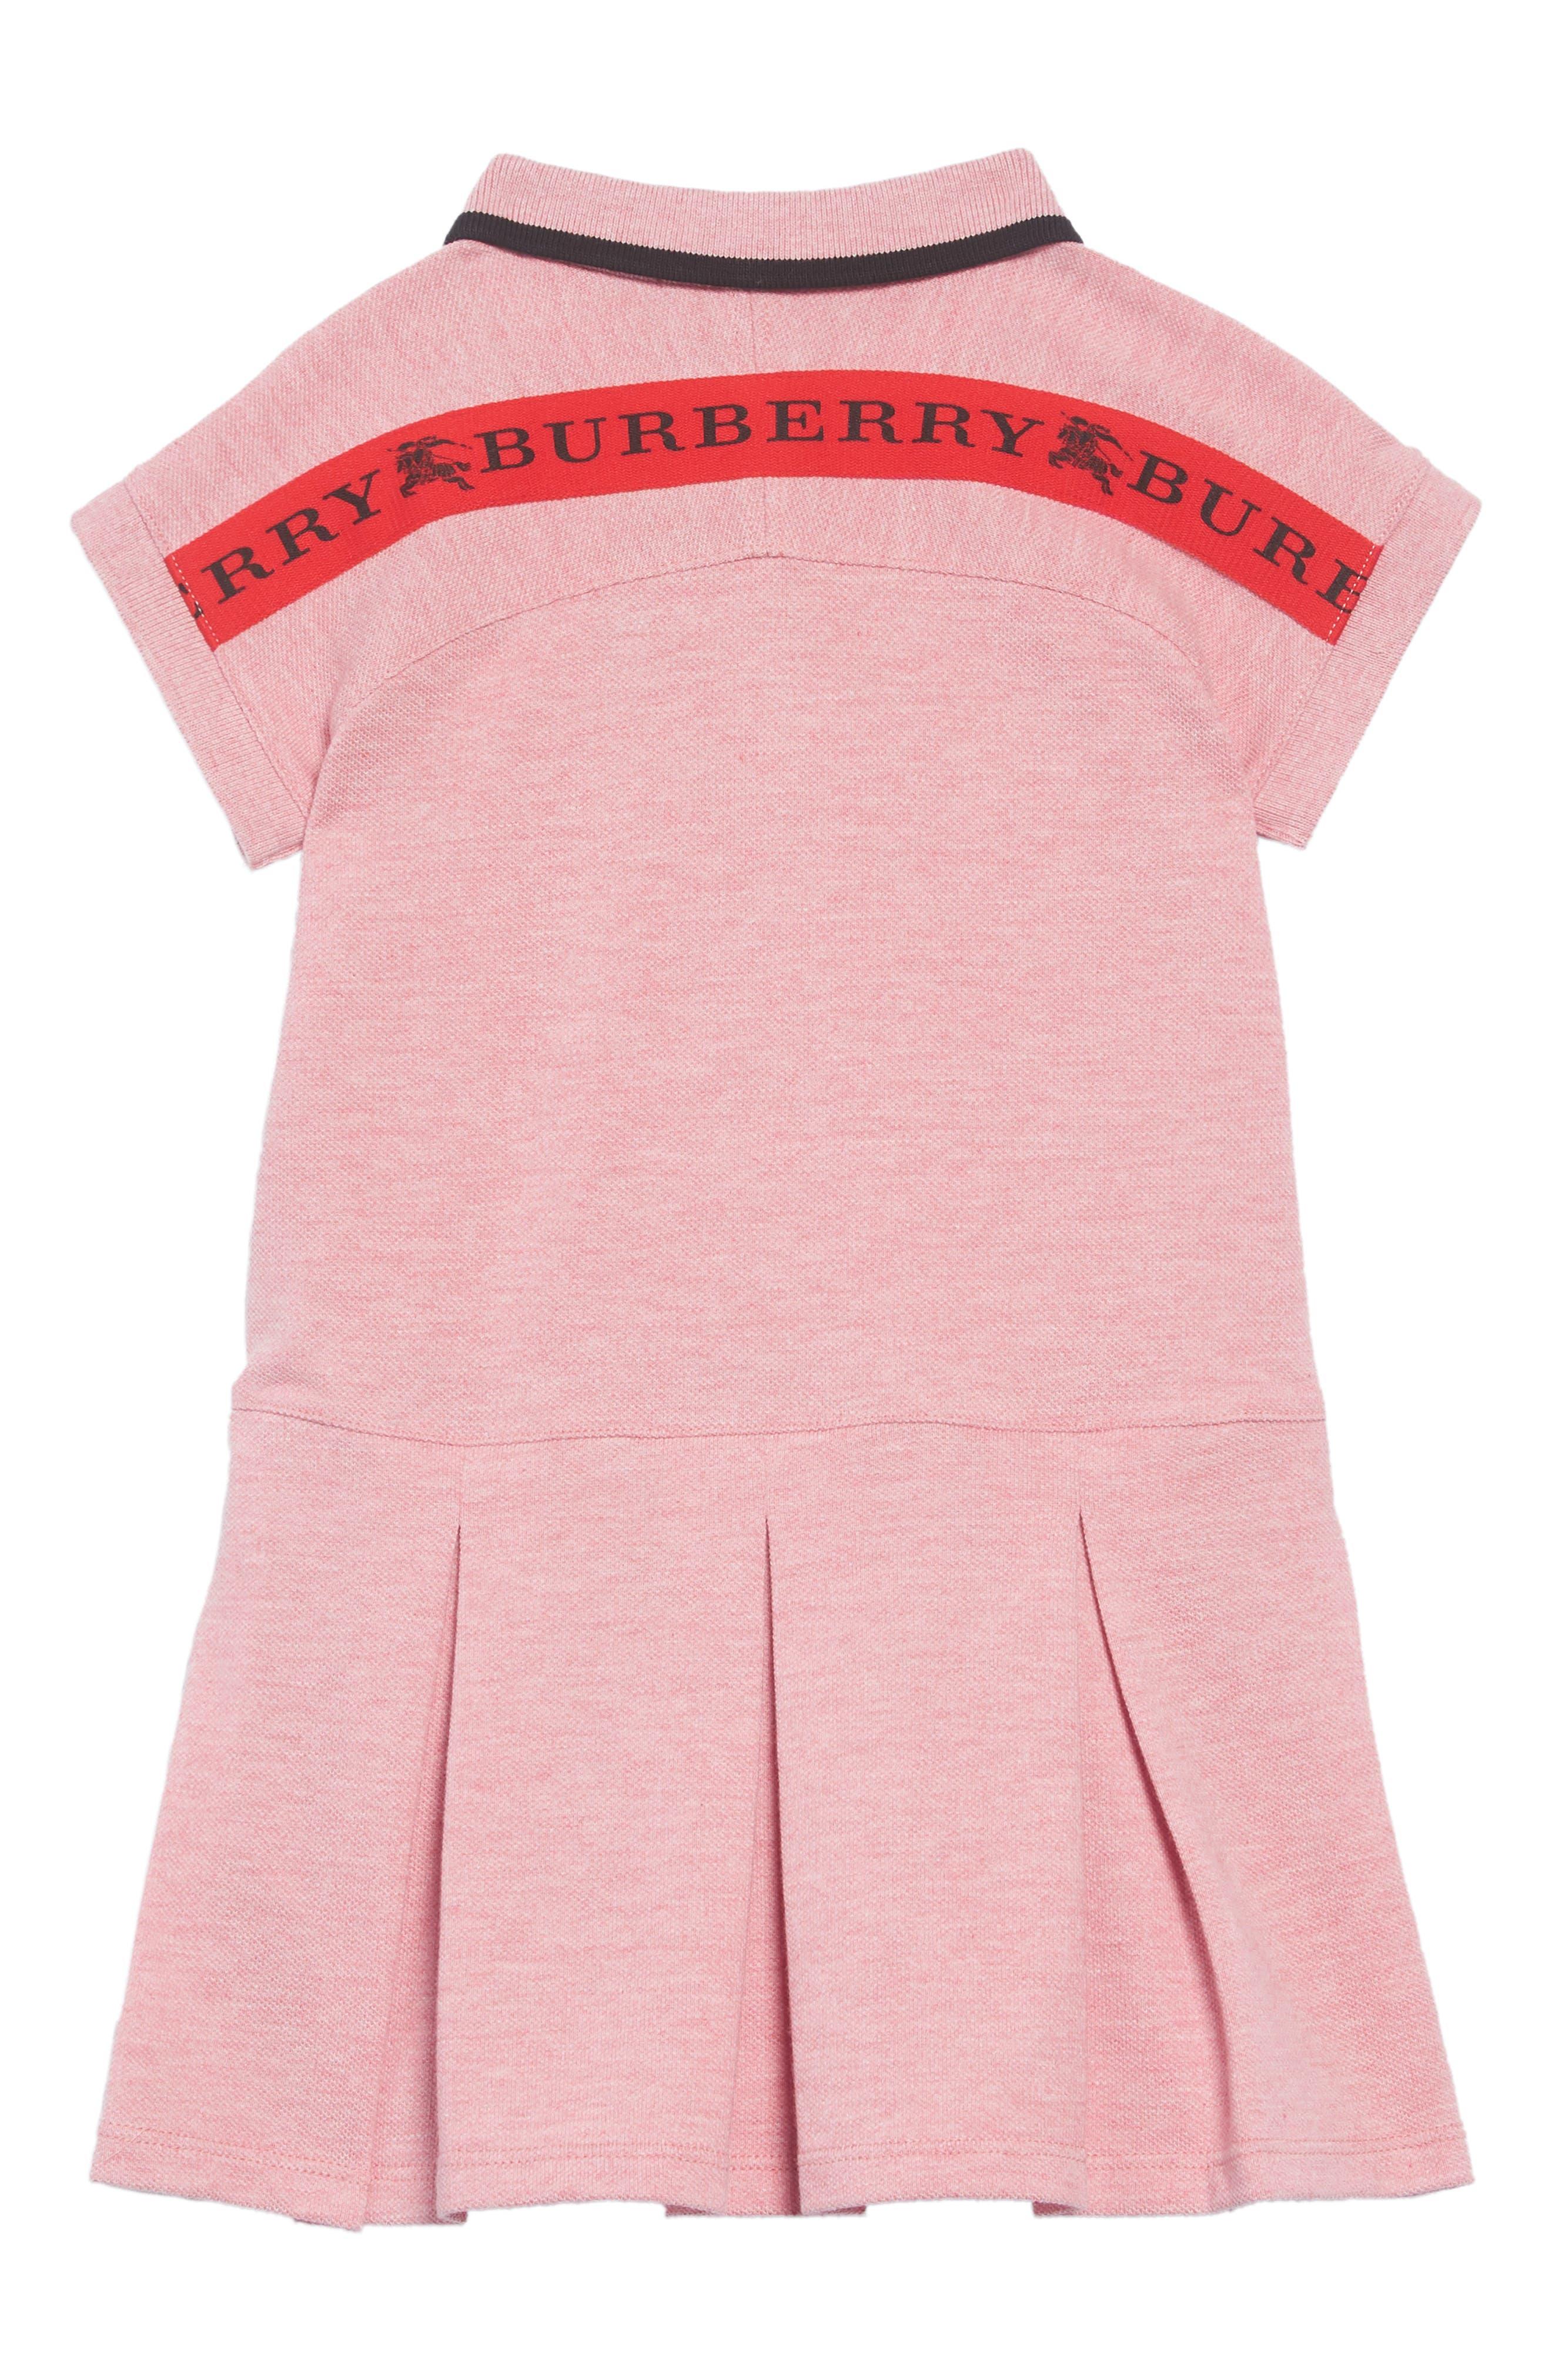 Mollyanna Polo Dress,                             Alternate thumbnail 2, color,                             PALE PINK MELANGE